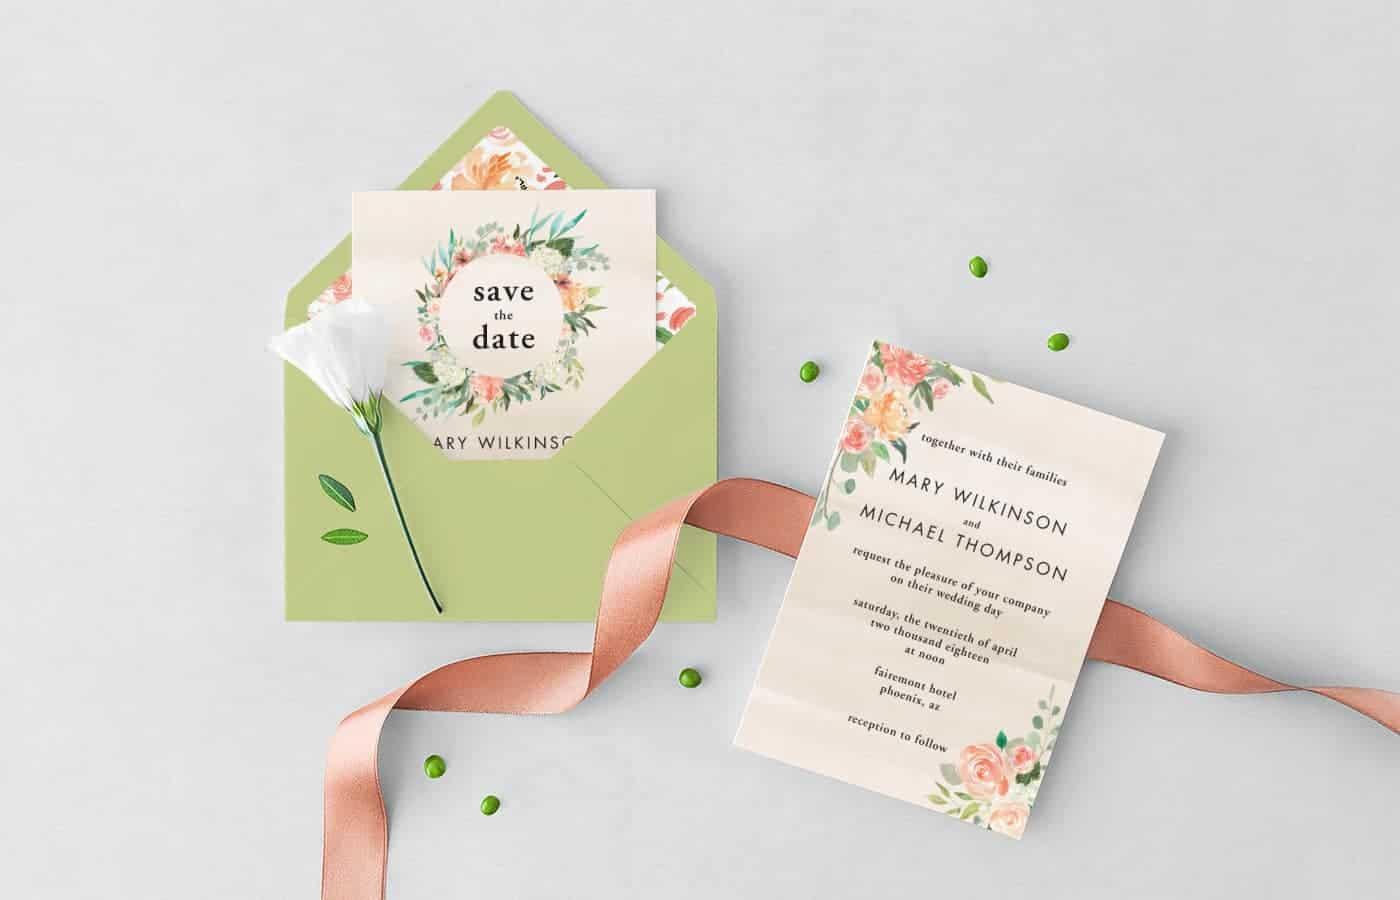 photograph regarding Etsy Printable Invitations named Etsy Printable Marriage Invites - Eyestigmatic Style